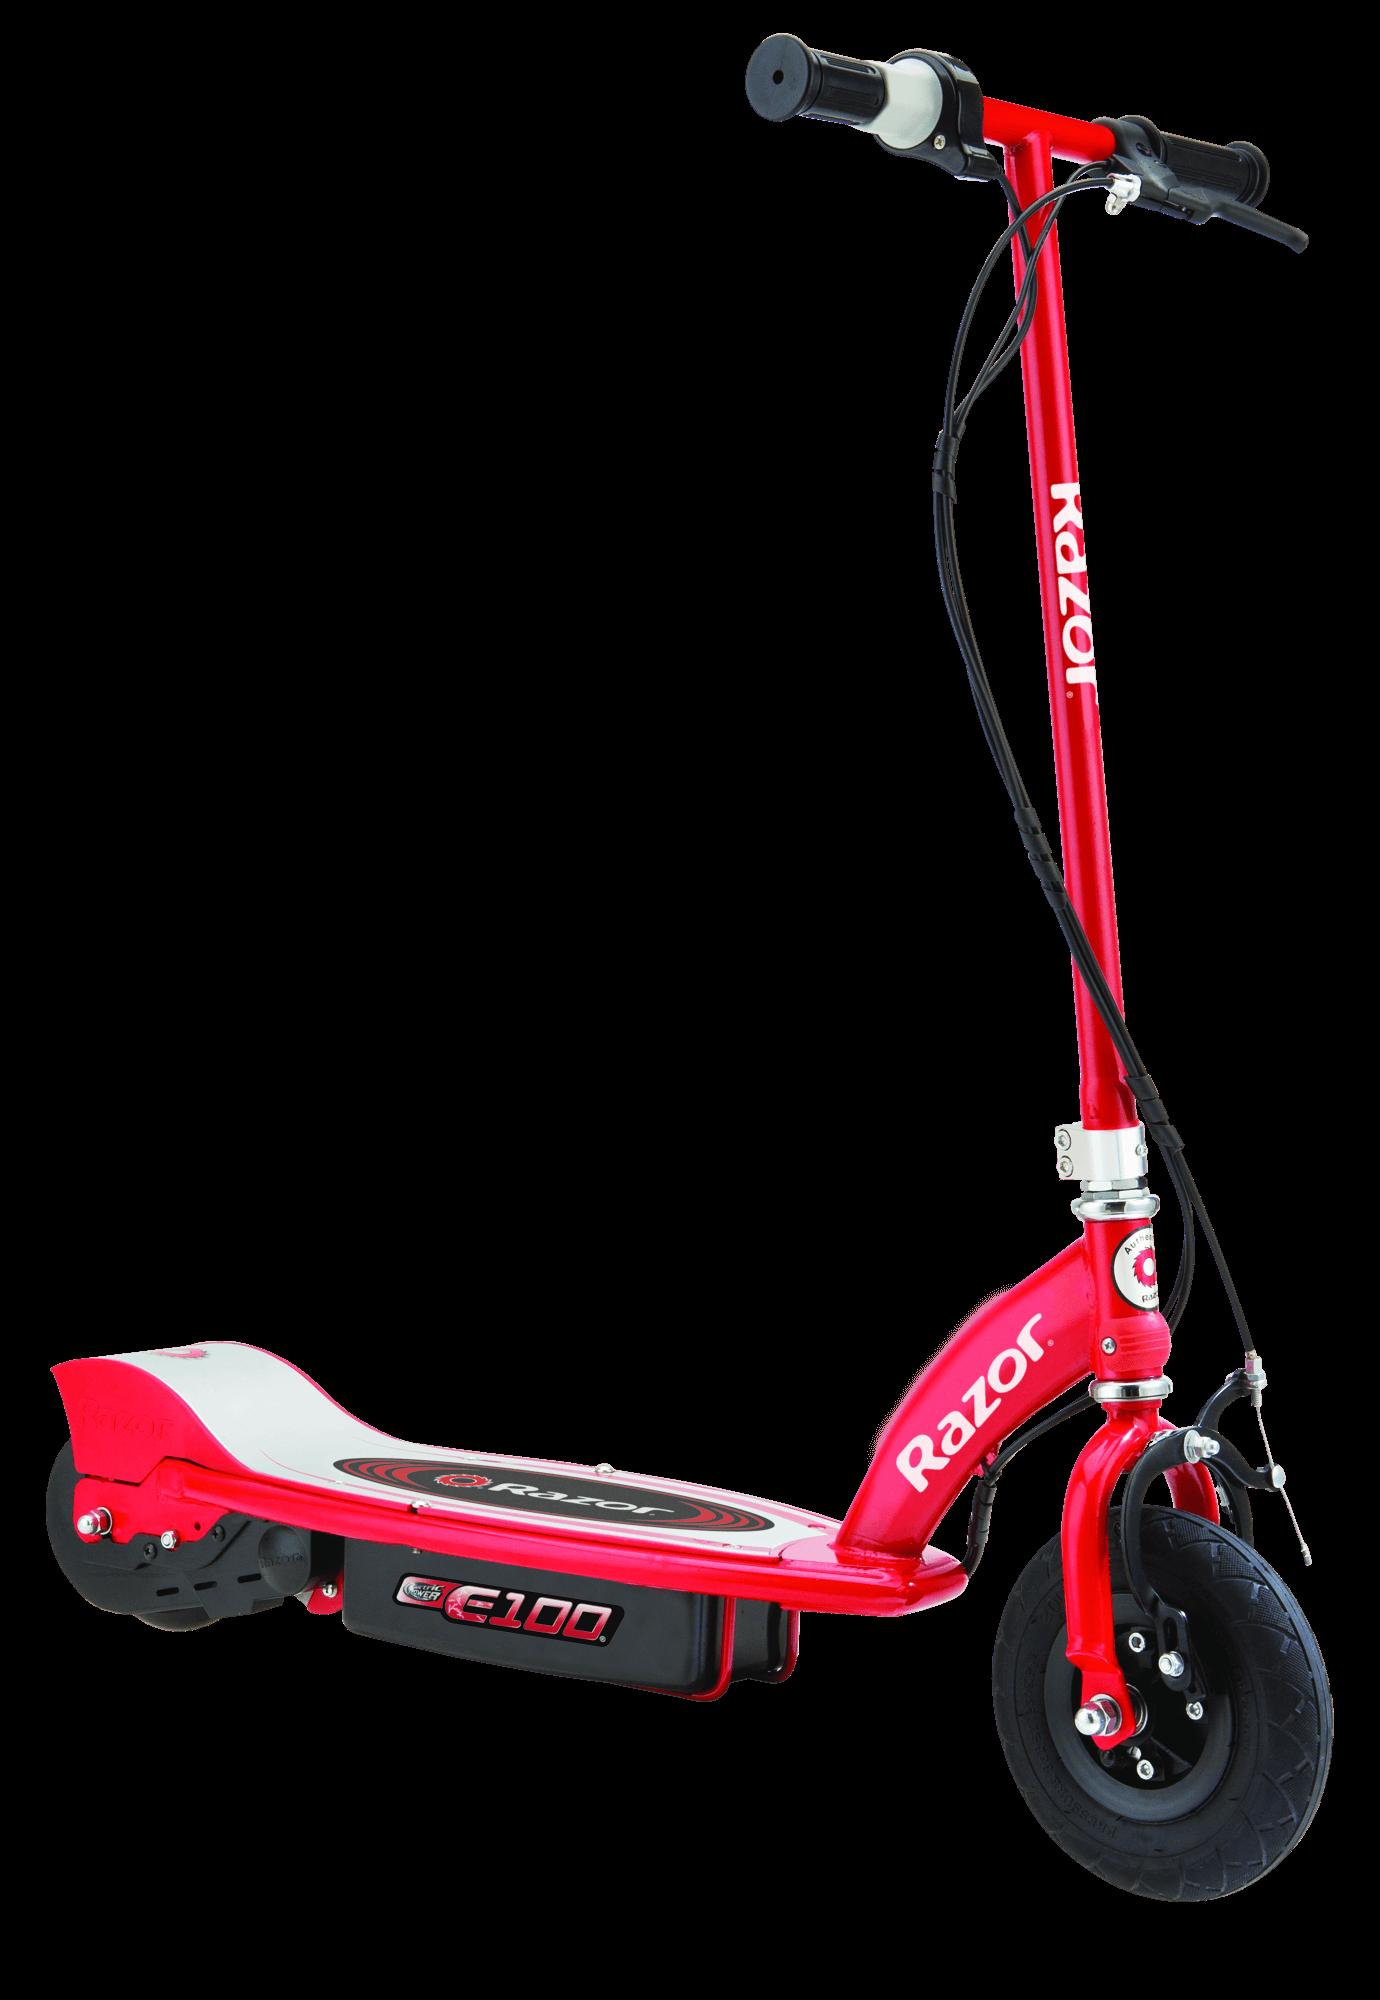 razor e100 electric scooter wiring diagram inverter previous